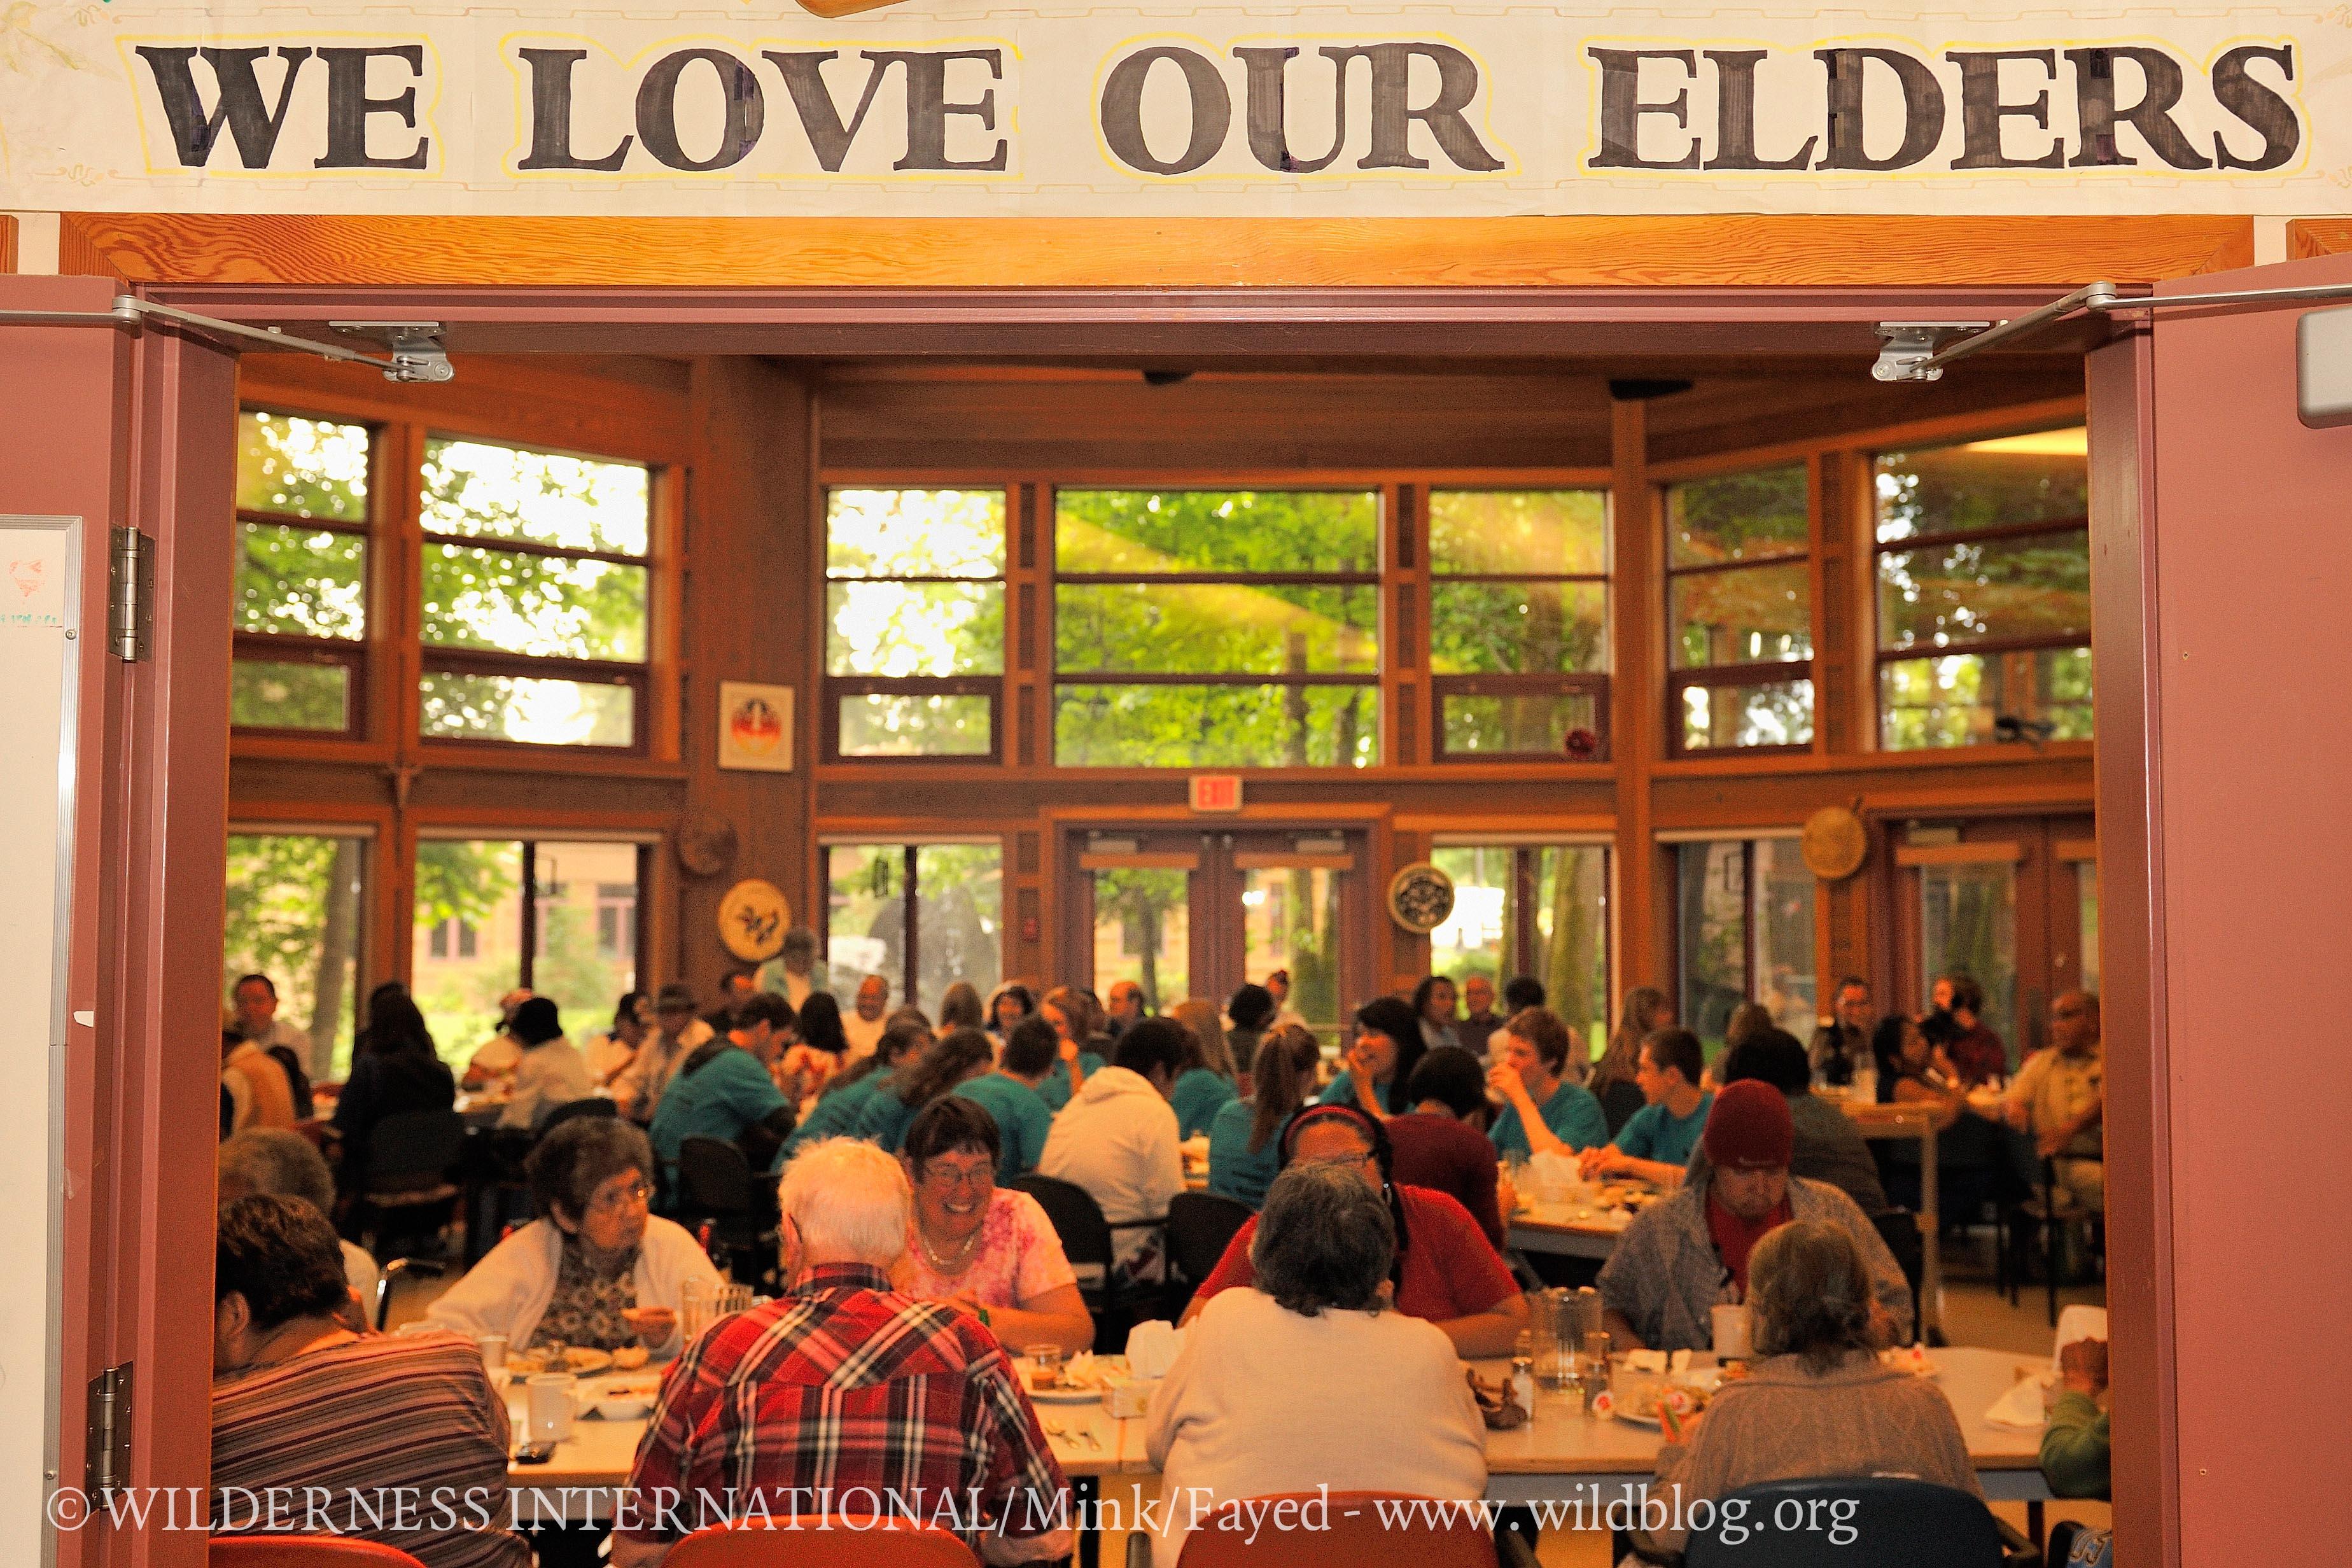 http://wi.wildblog.org/wp-content/uploads/2012/07/lr-9866.jpg